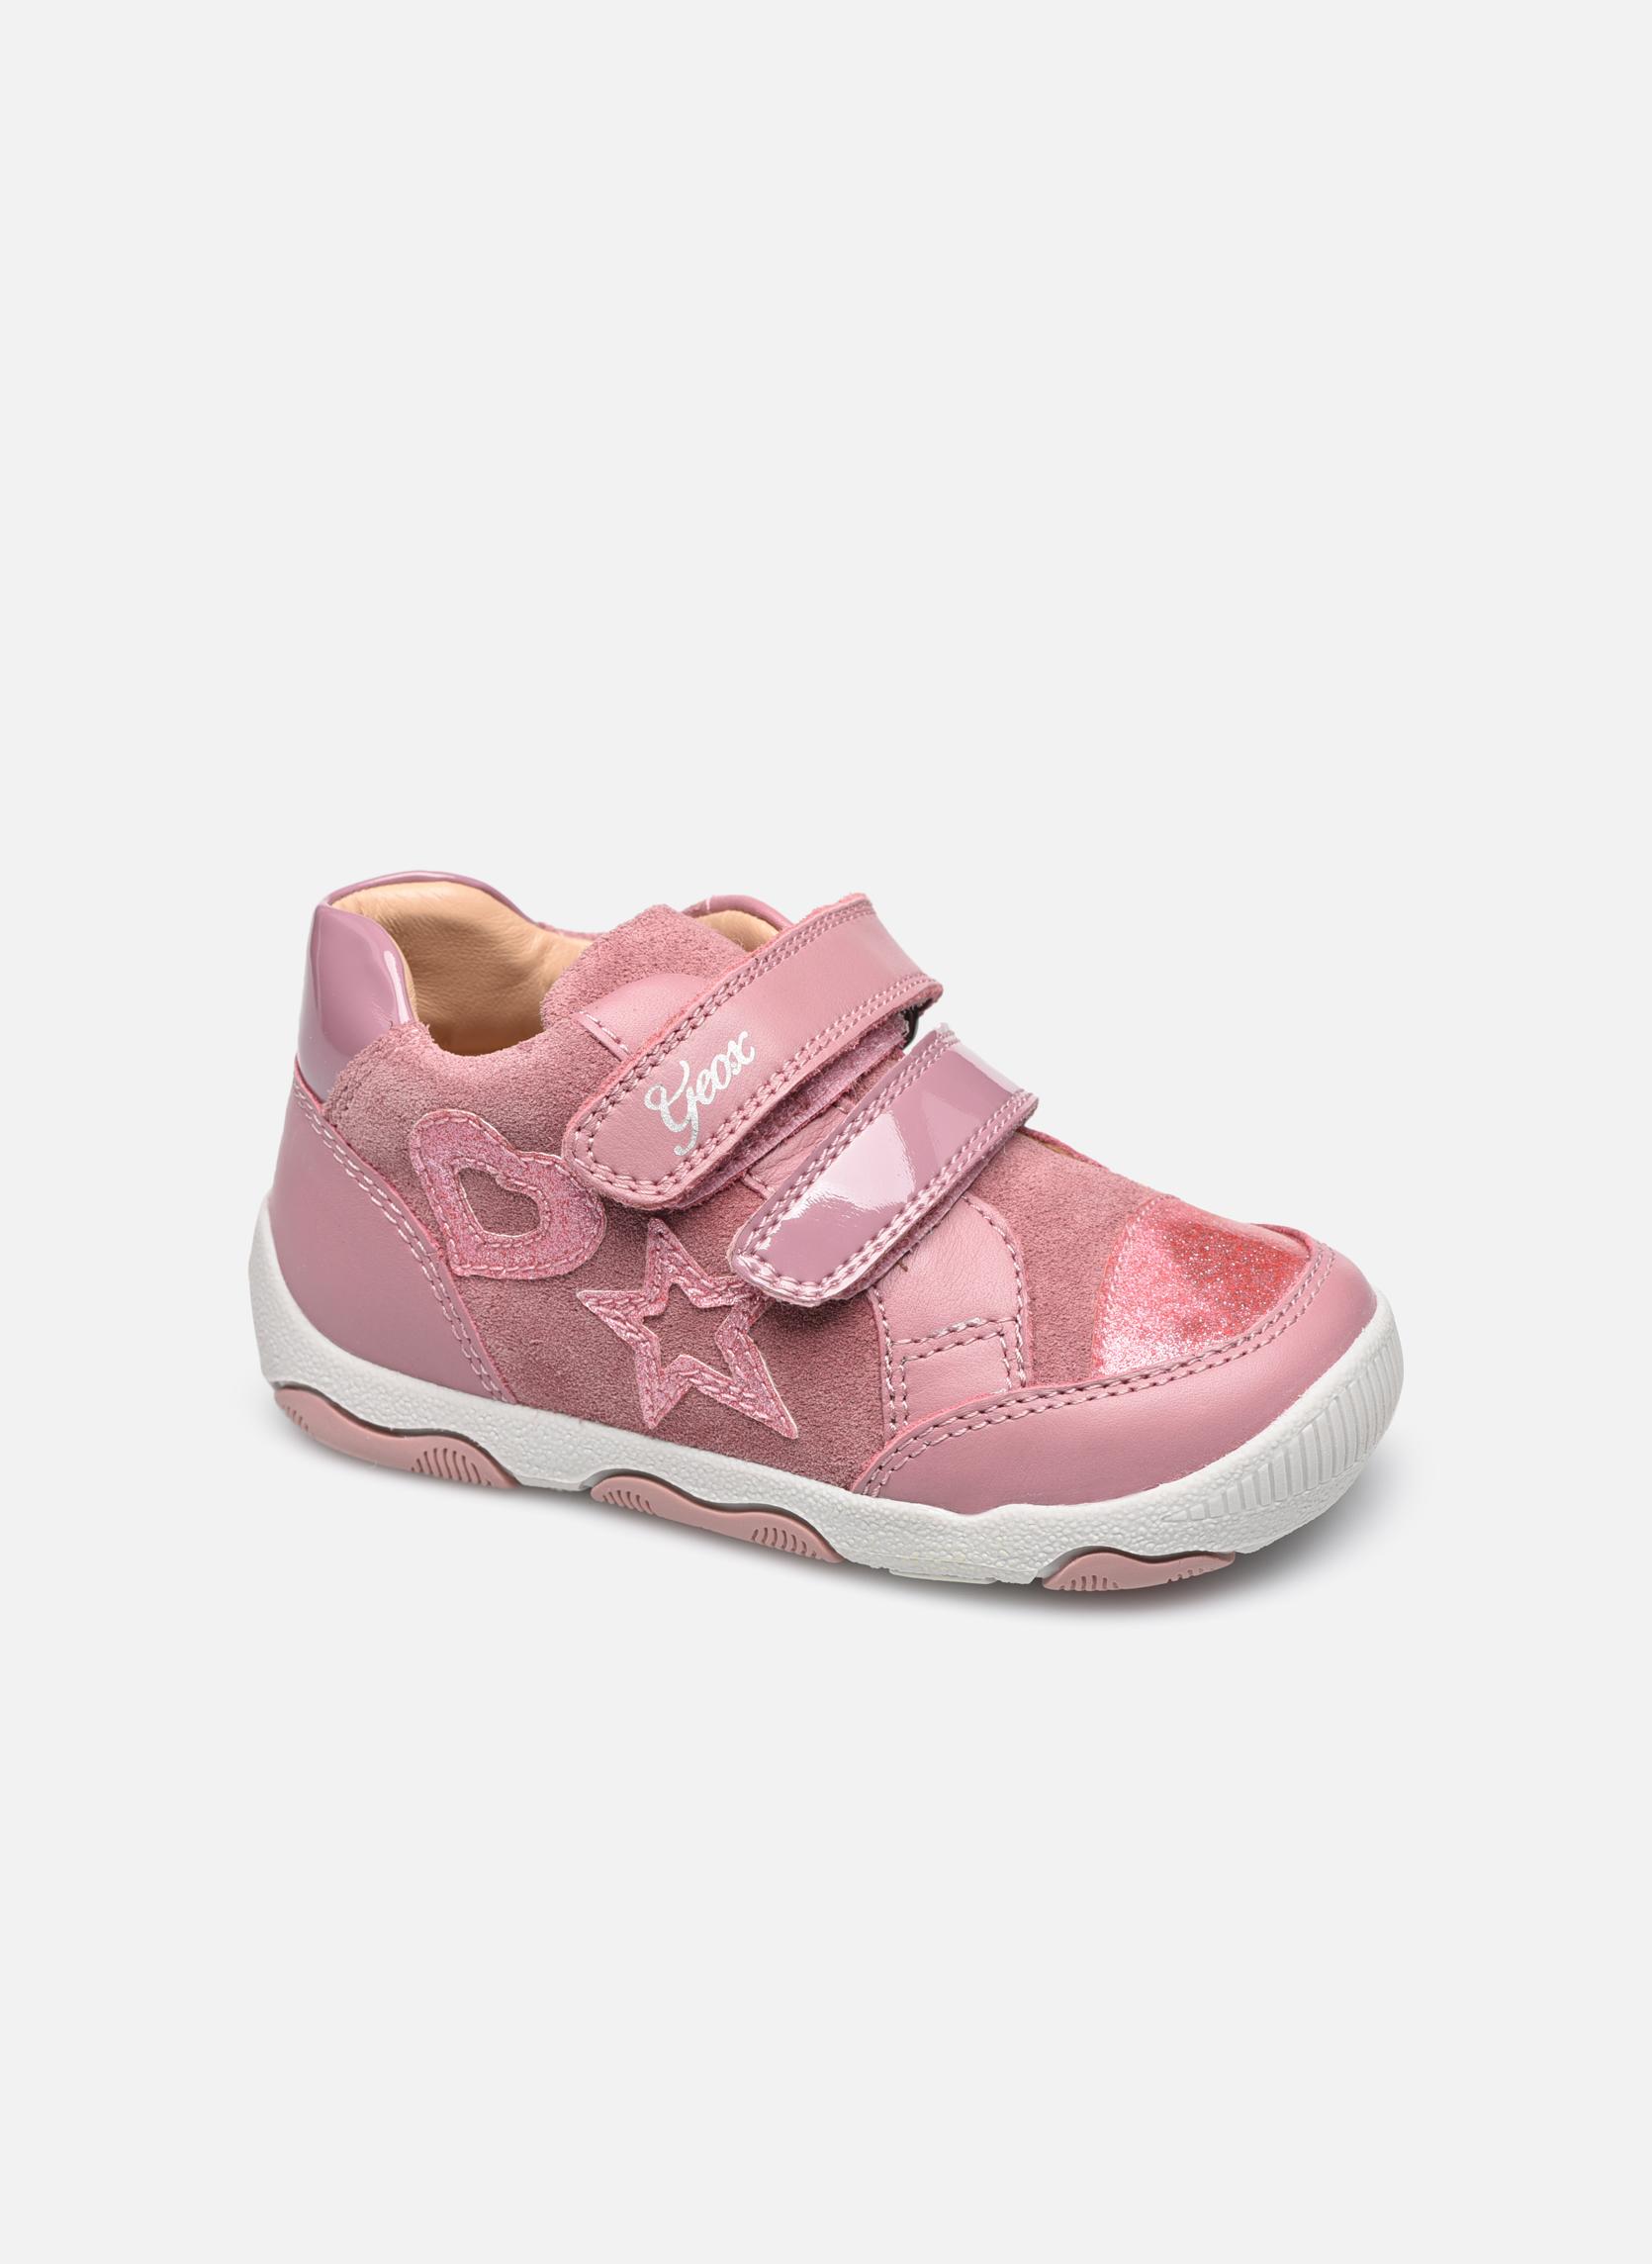 dk pink